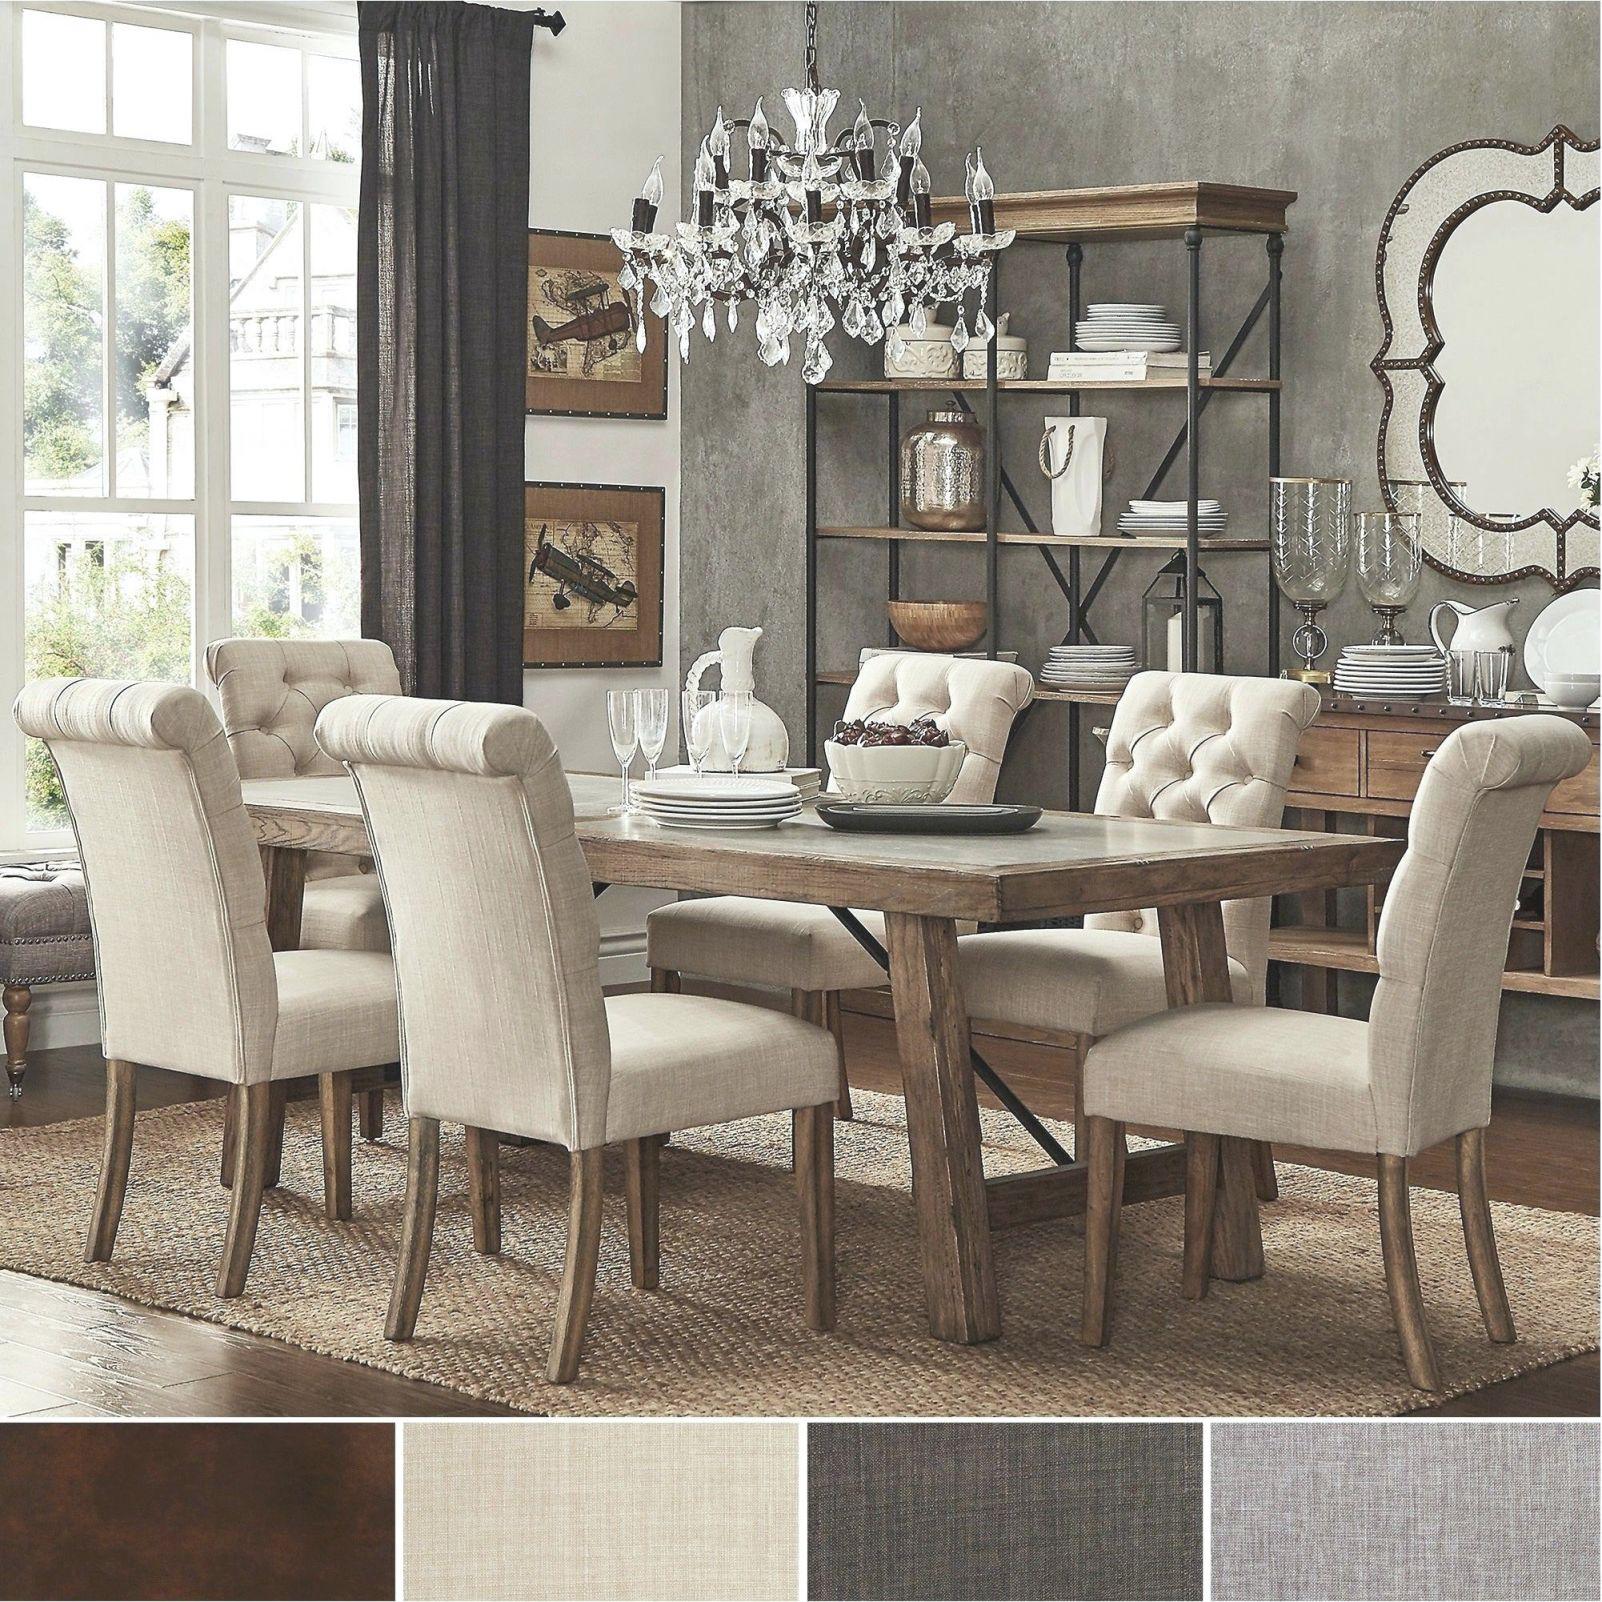 French Living Room Set Provincial Sets – Noisemag.co for French Provincial Living Room Furniture